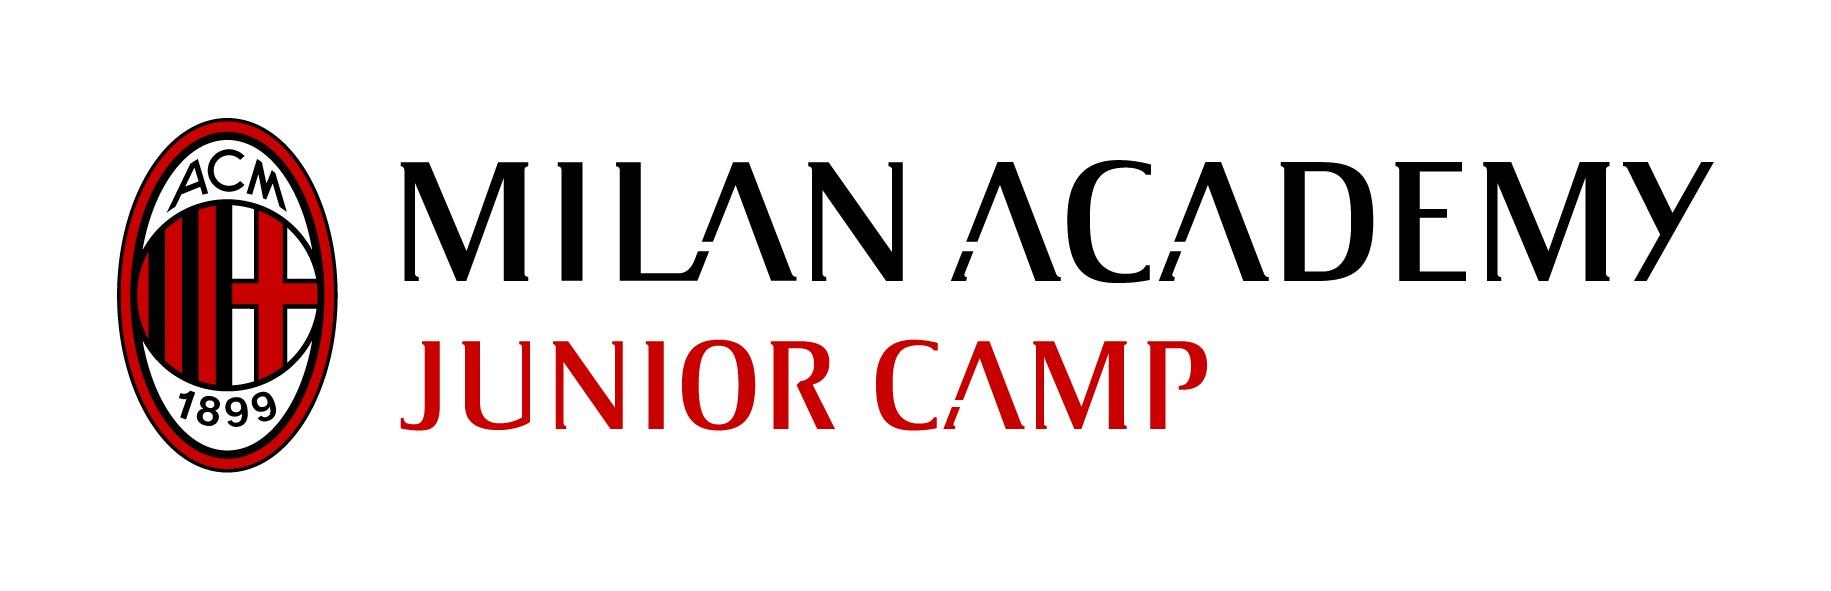 AC Milan Junior Camp - Sporteventi   LinkedIn